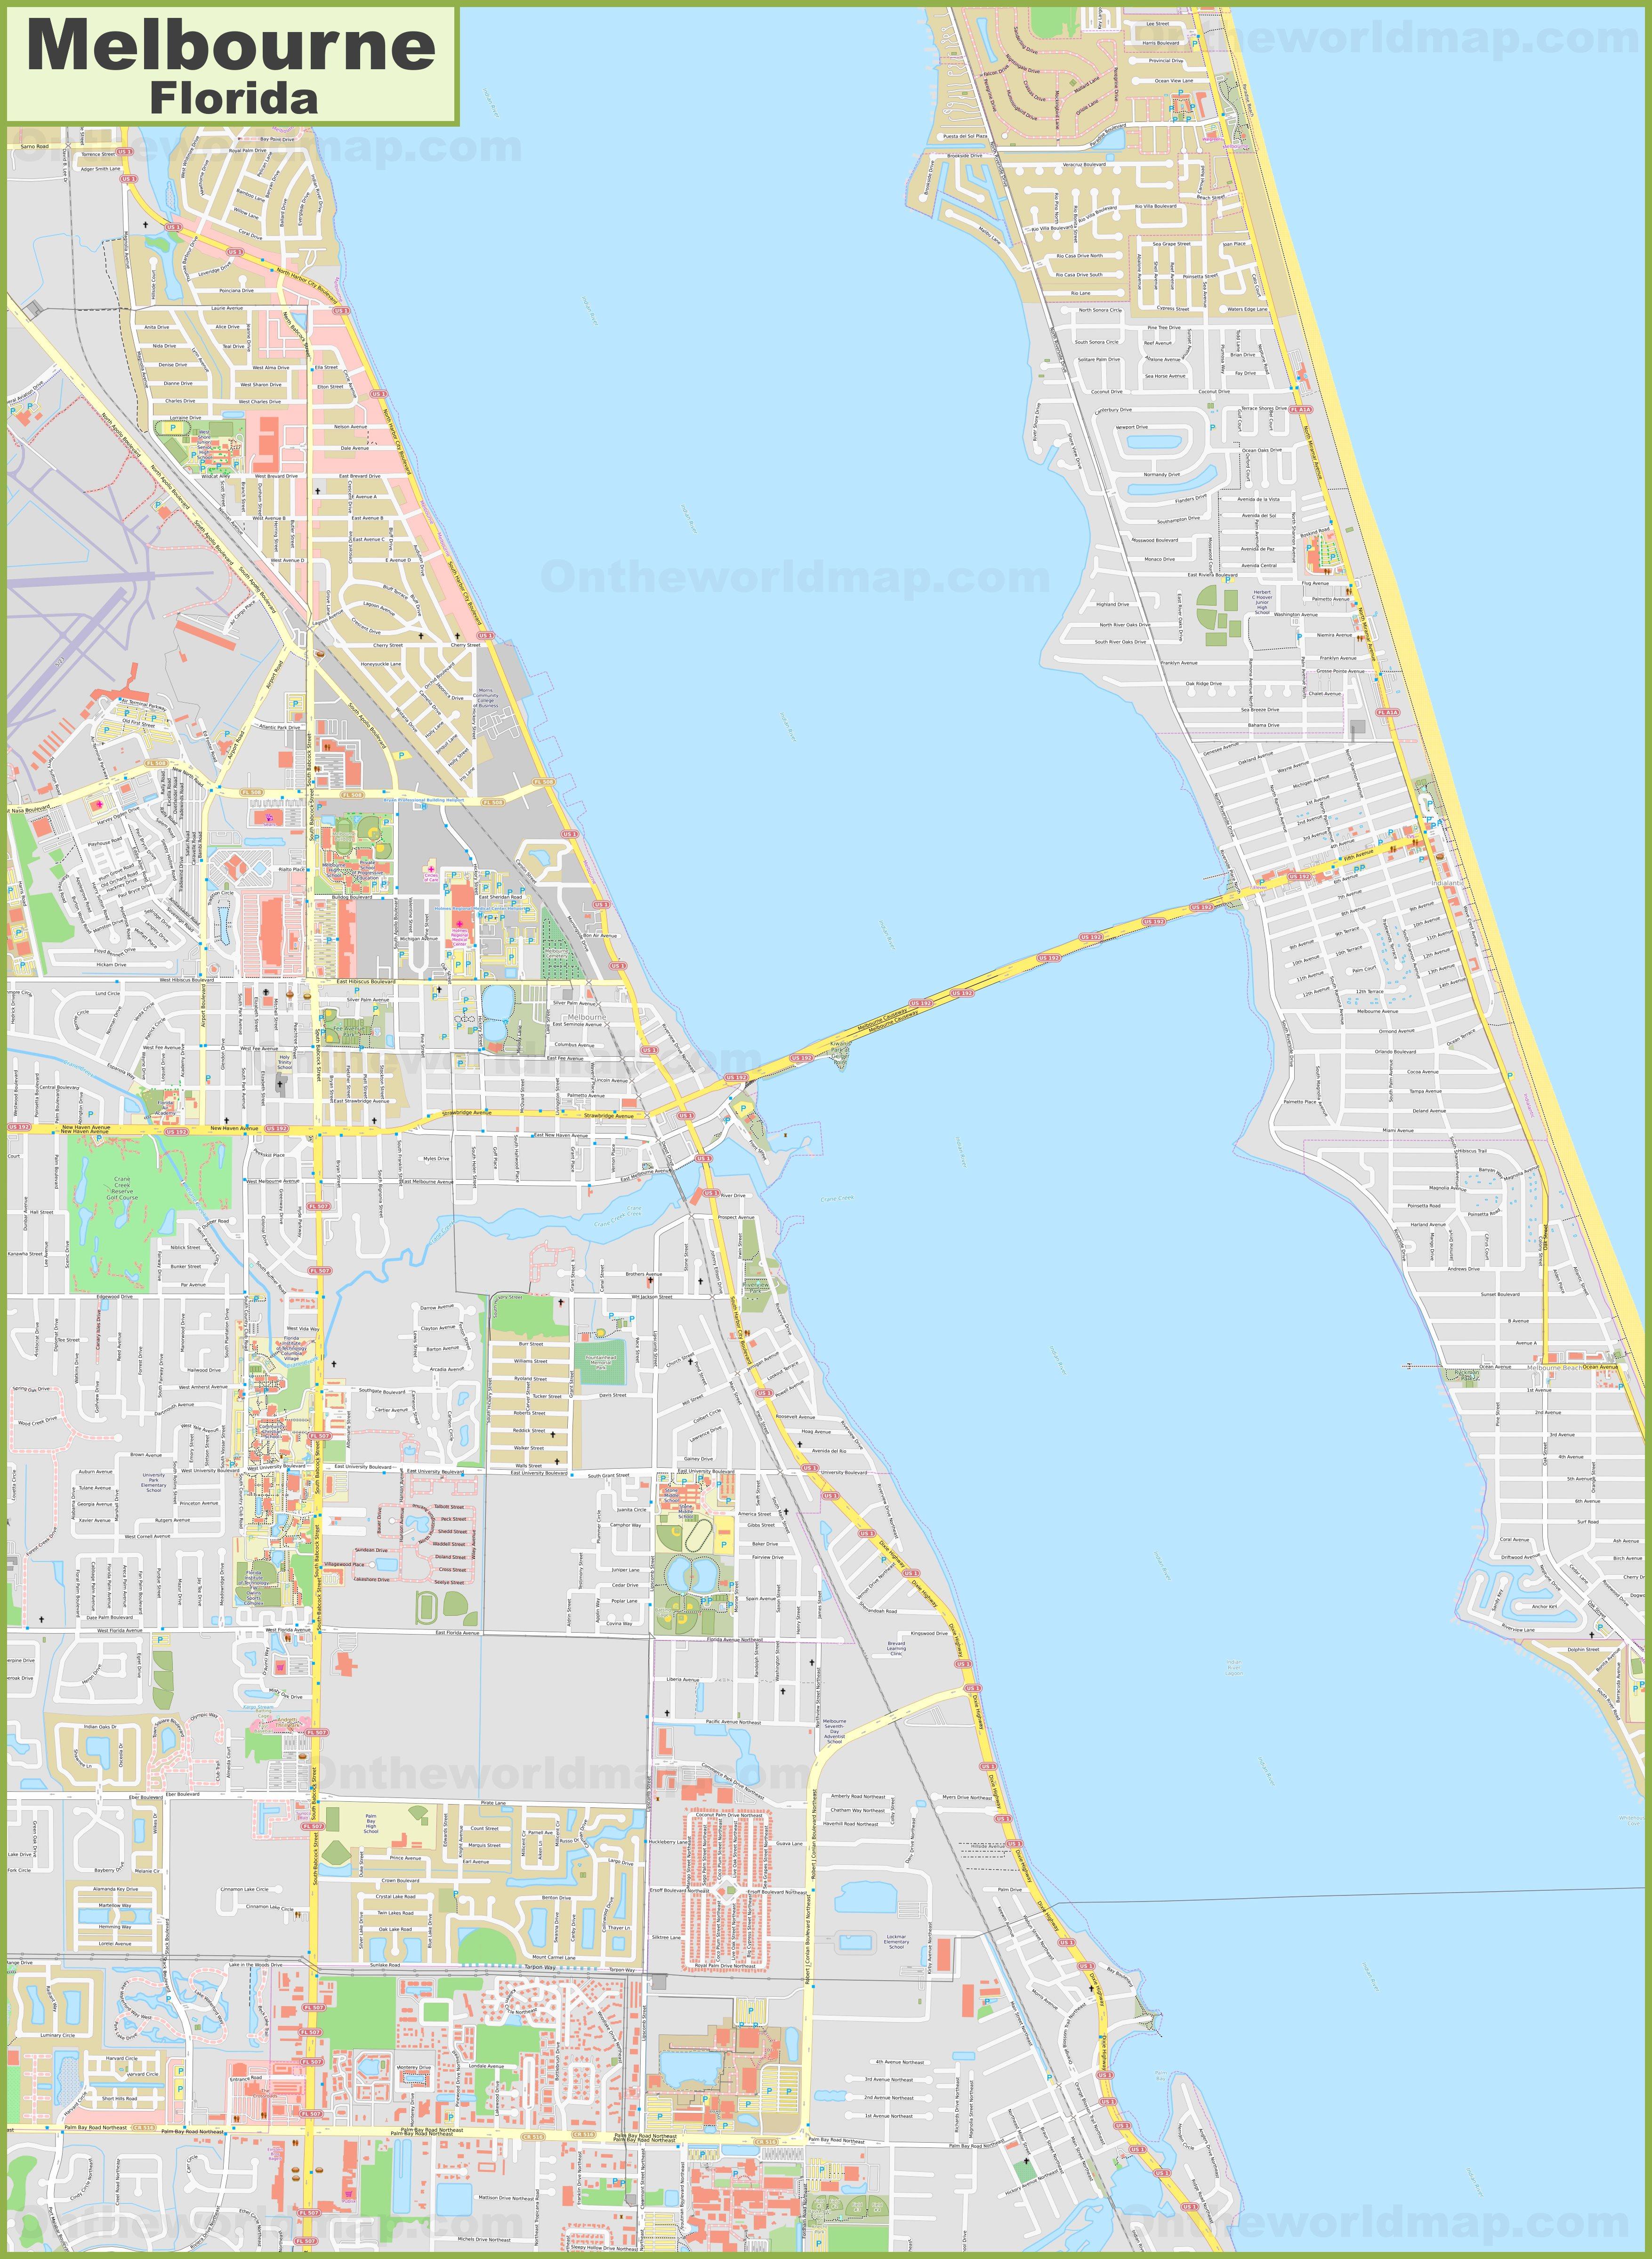 Large Detailed Map Of Melbourne Florida